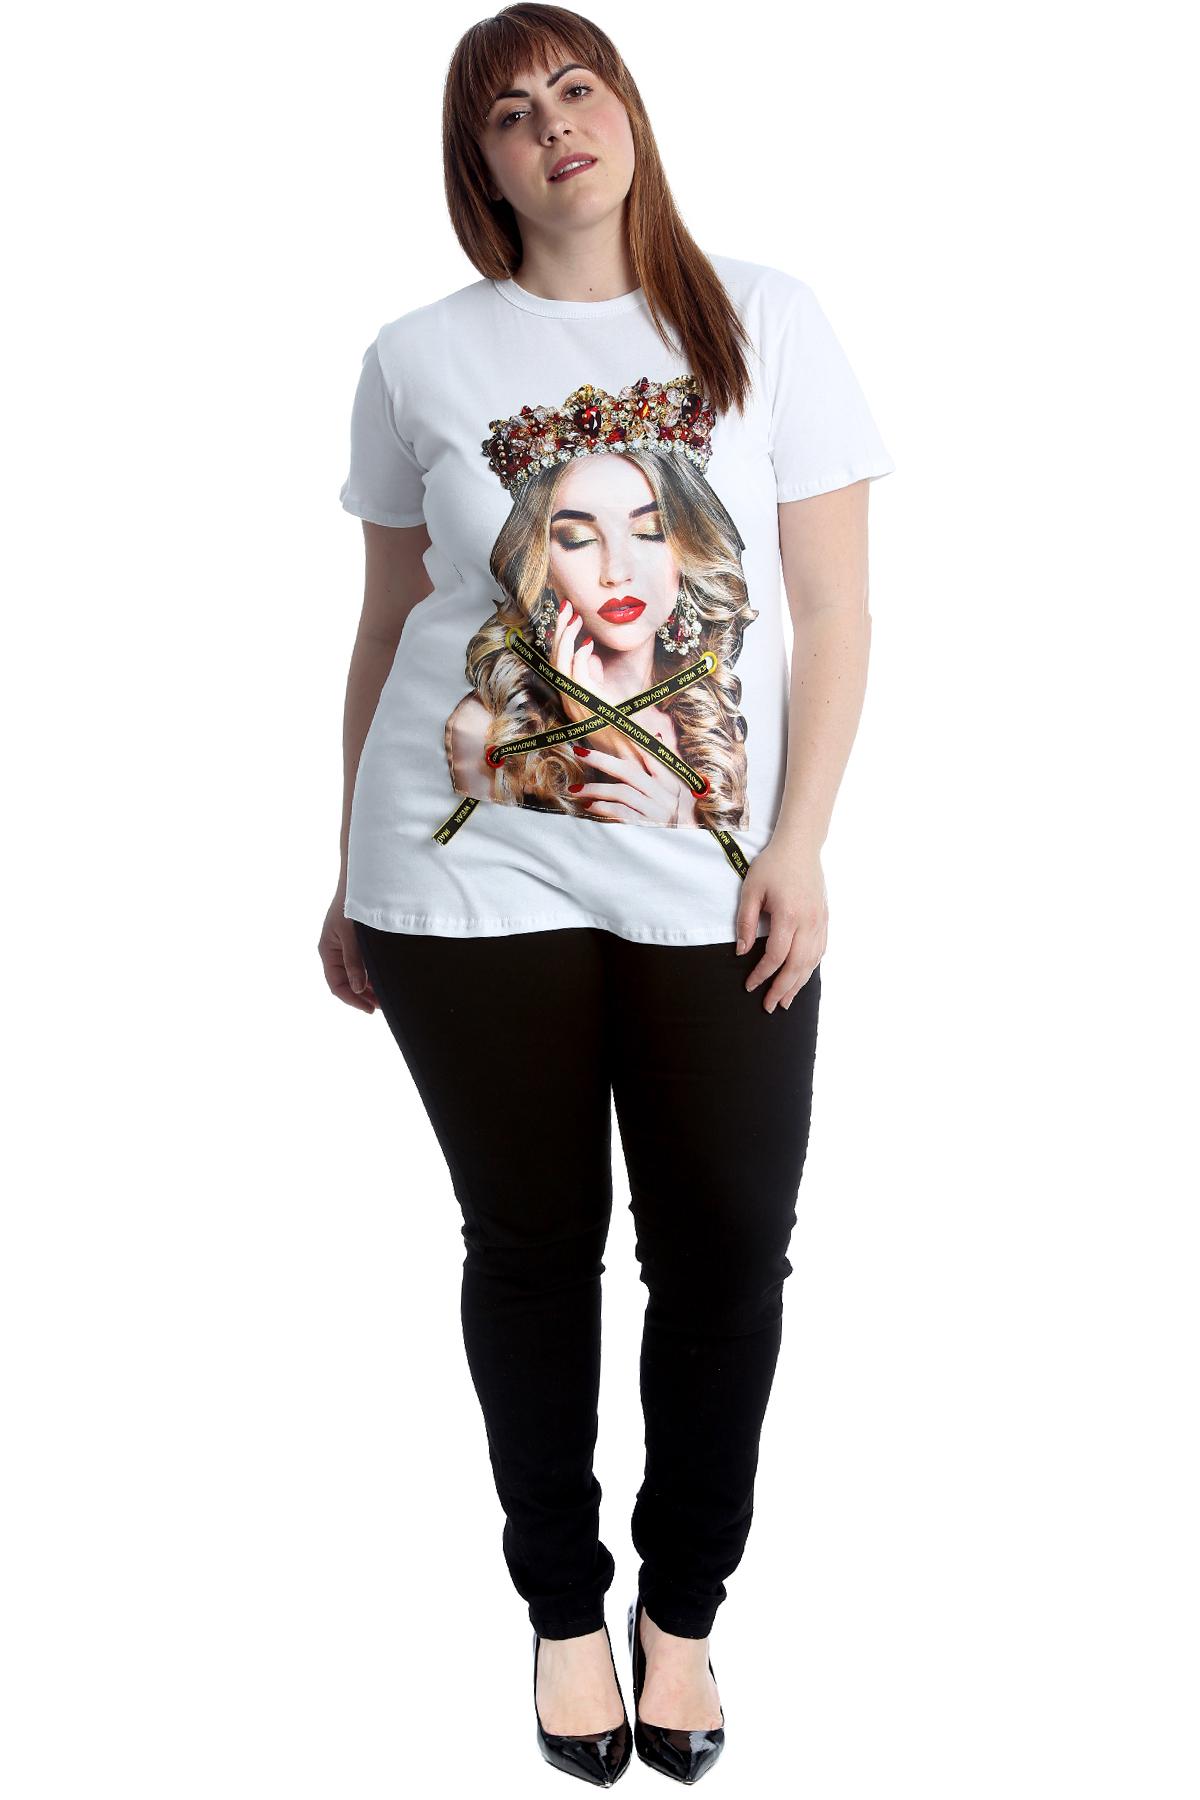 New Womens Plus Size T-Shirt Ladies Graphic Applique Top Cotton Tussles Crown